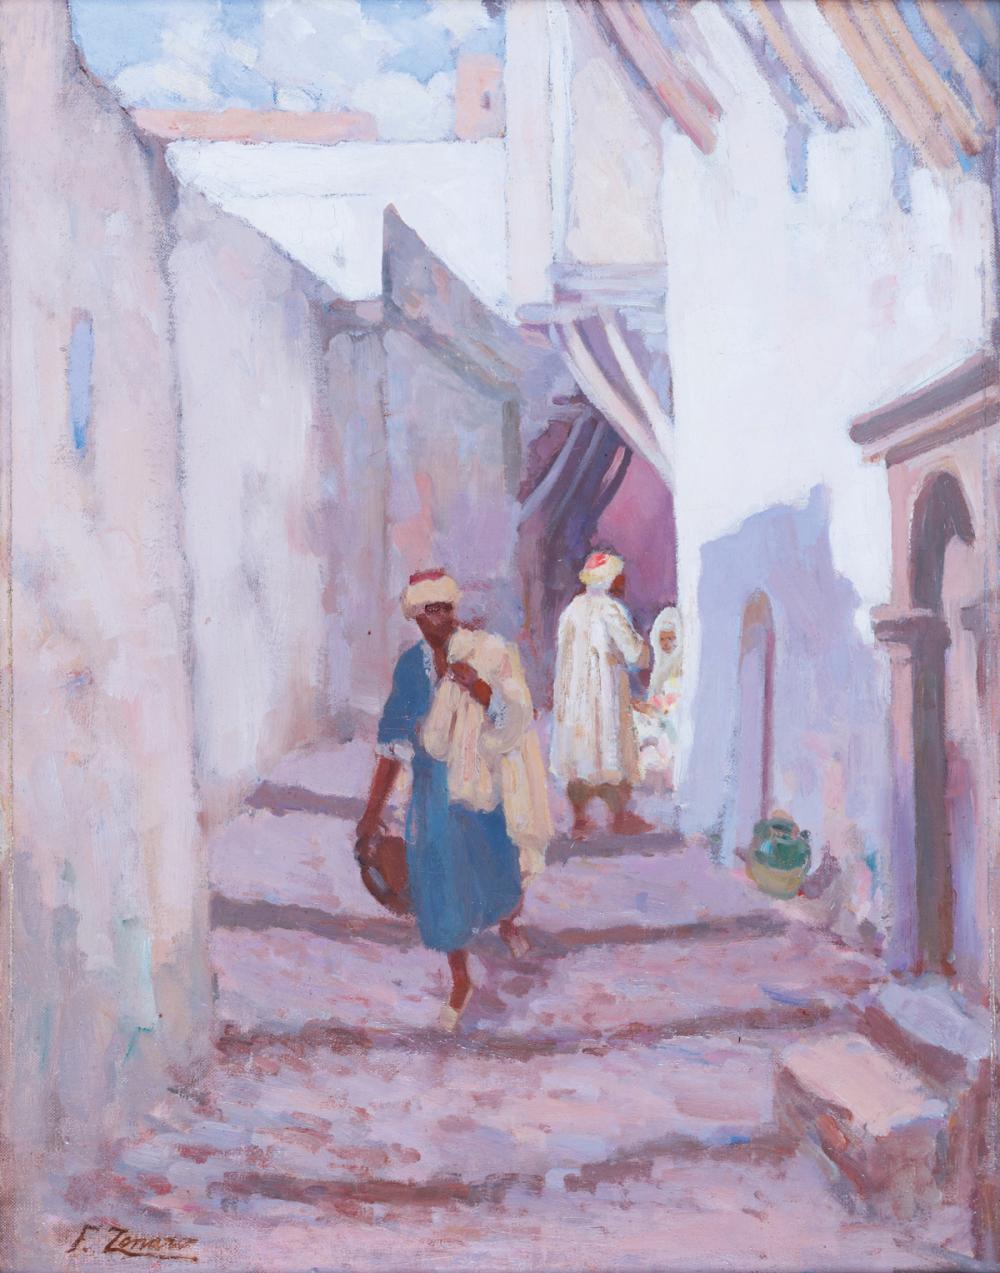 Faustino Zonaro 1913 Turkish Islamic Orientalist